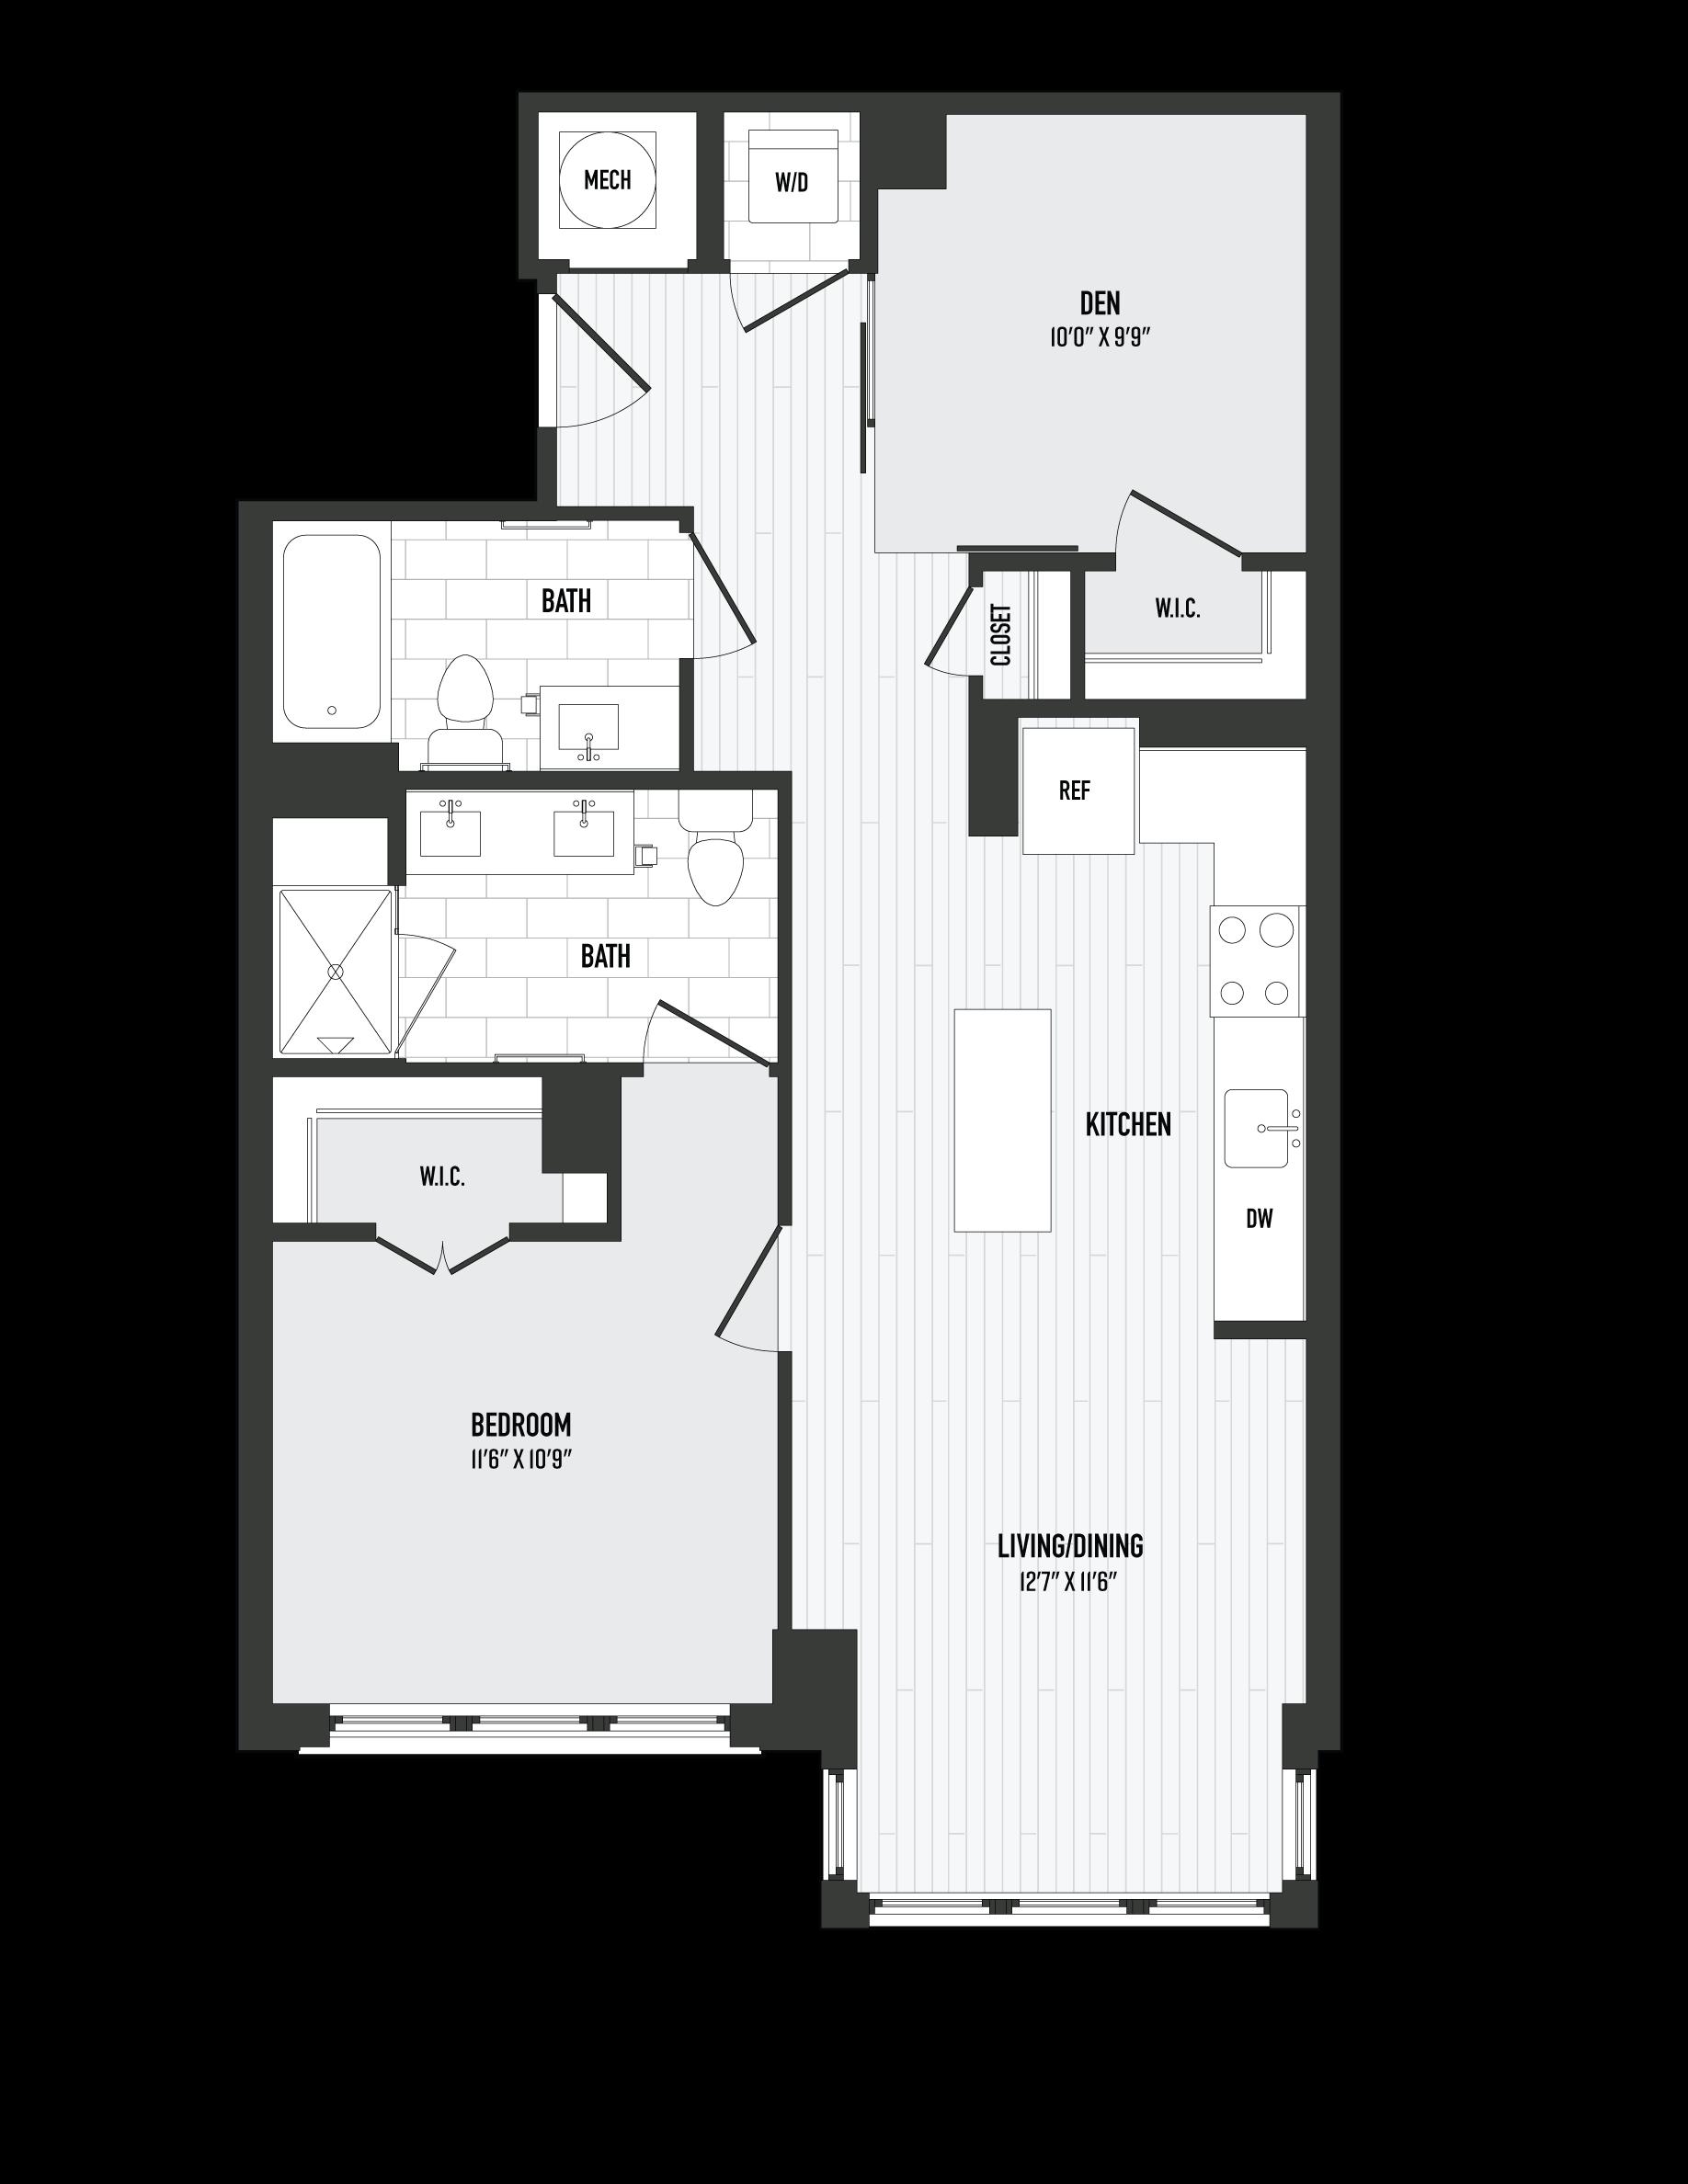 APT. 220 floor plan thumb